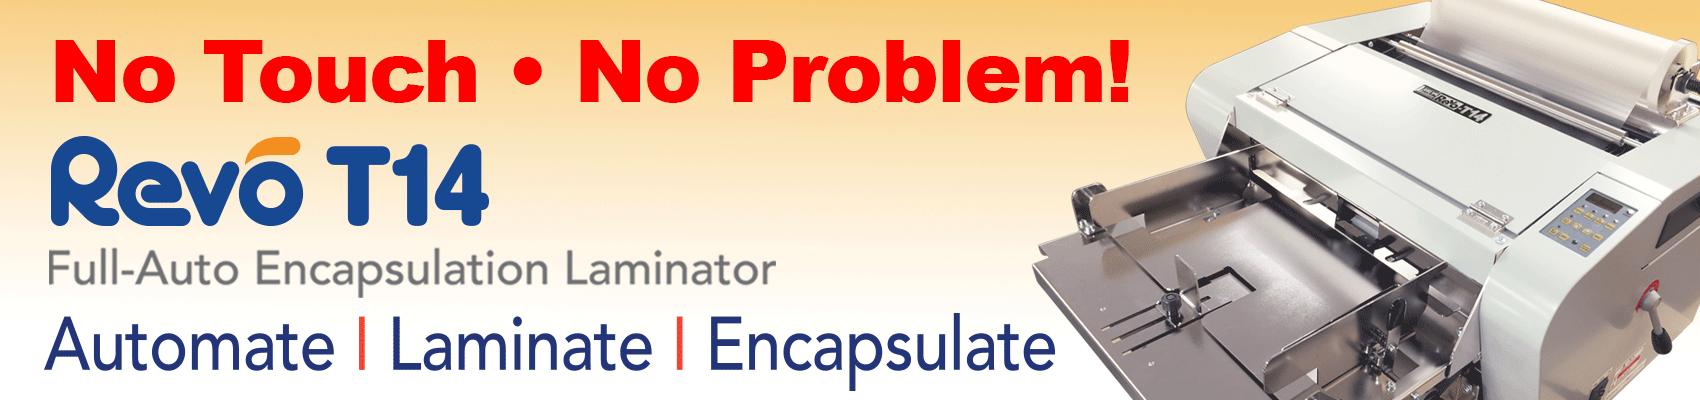 RevoT14 Full Auto Encapsulation Laminator